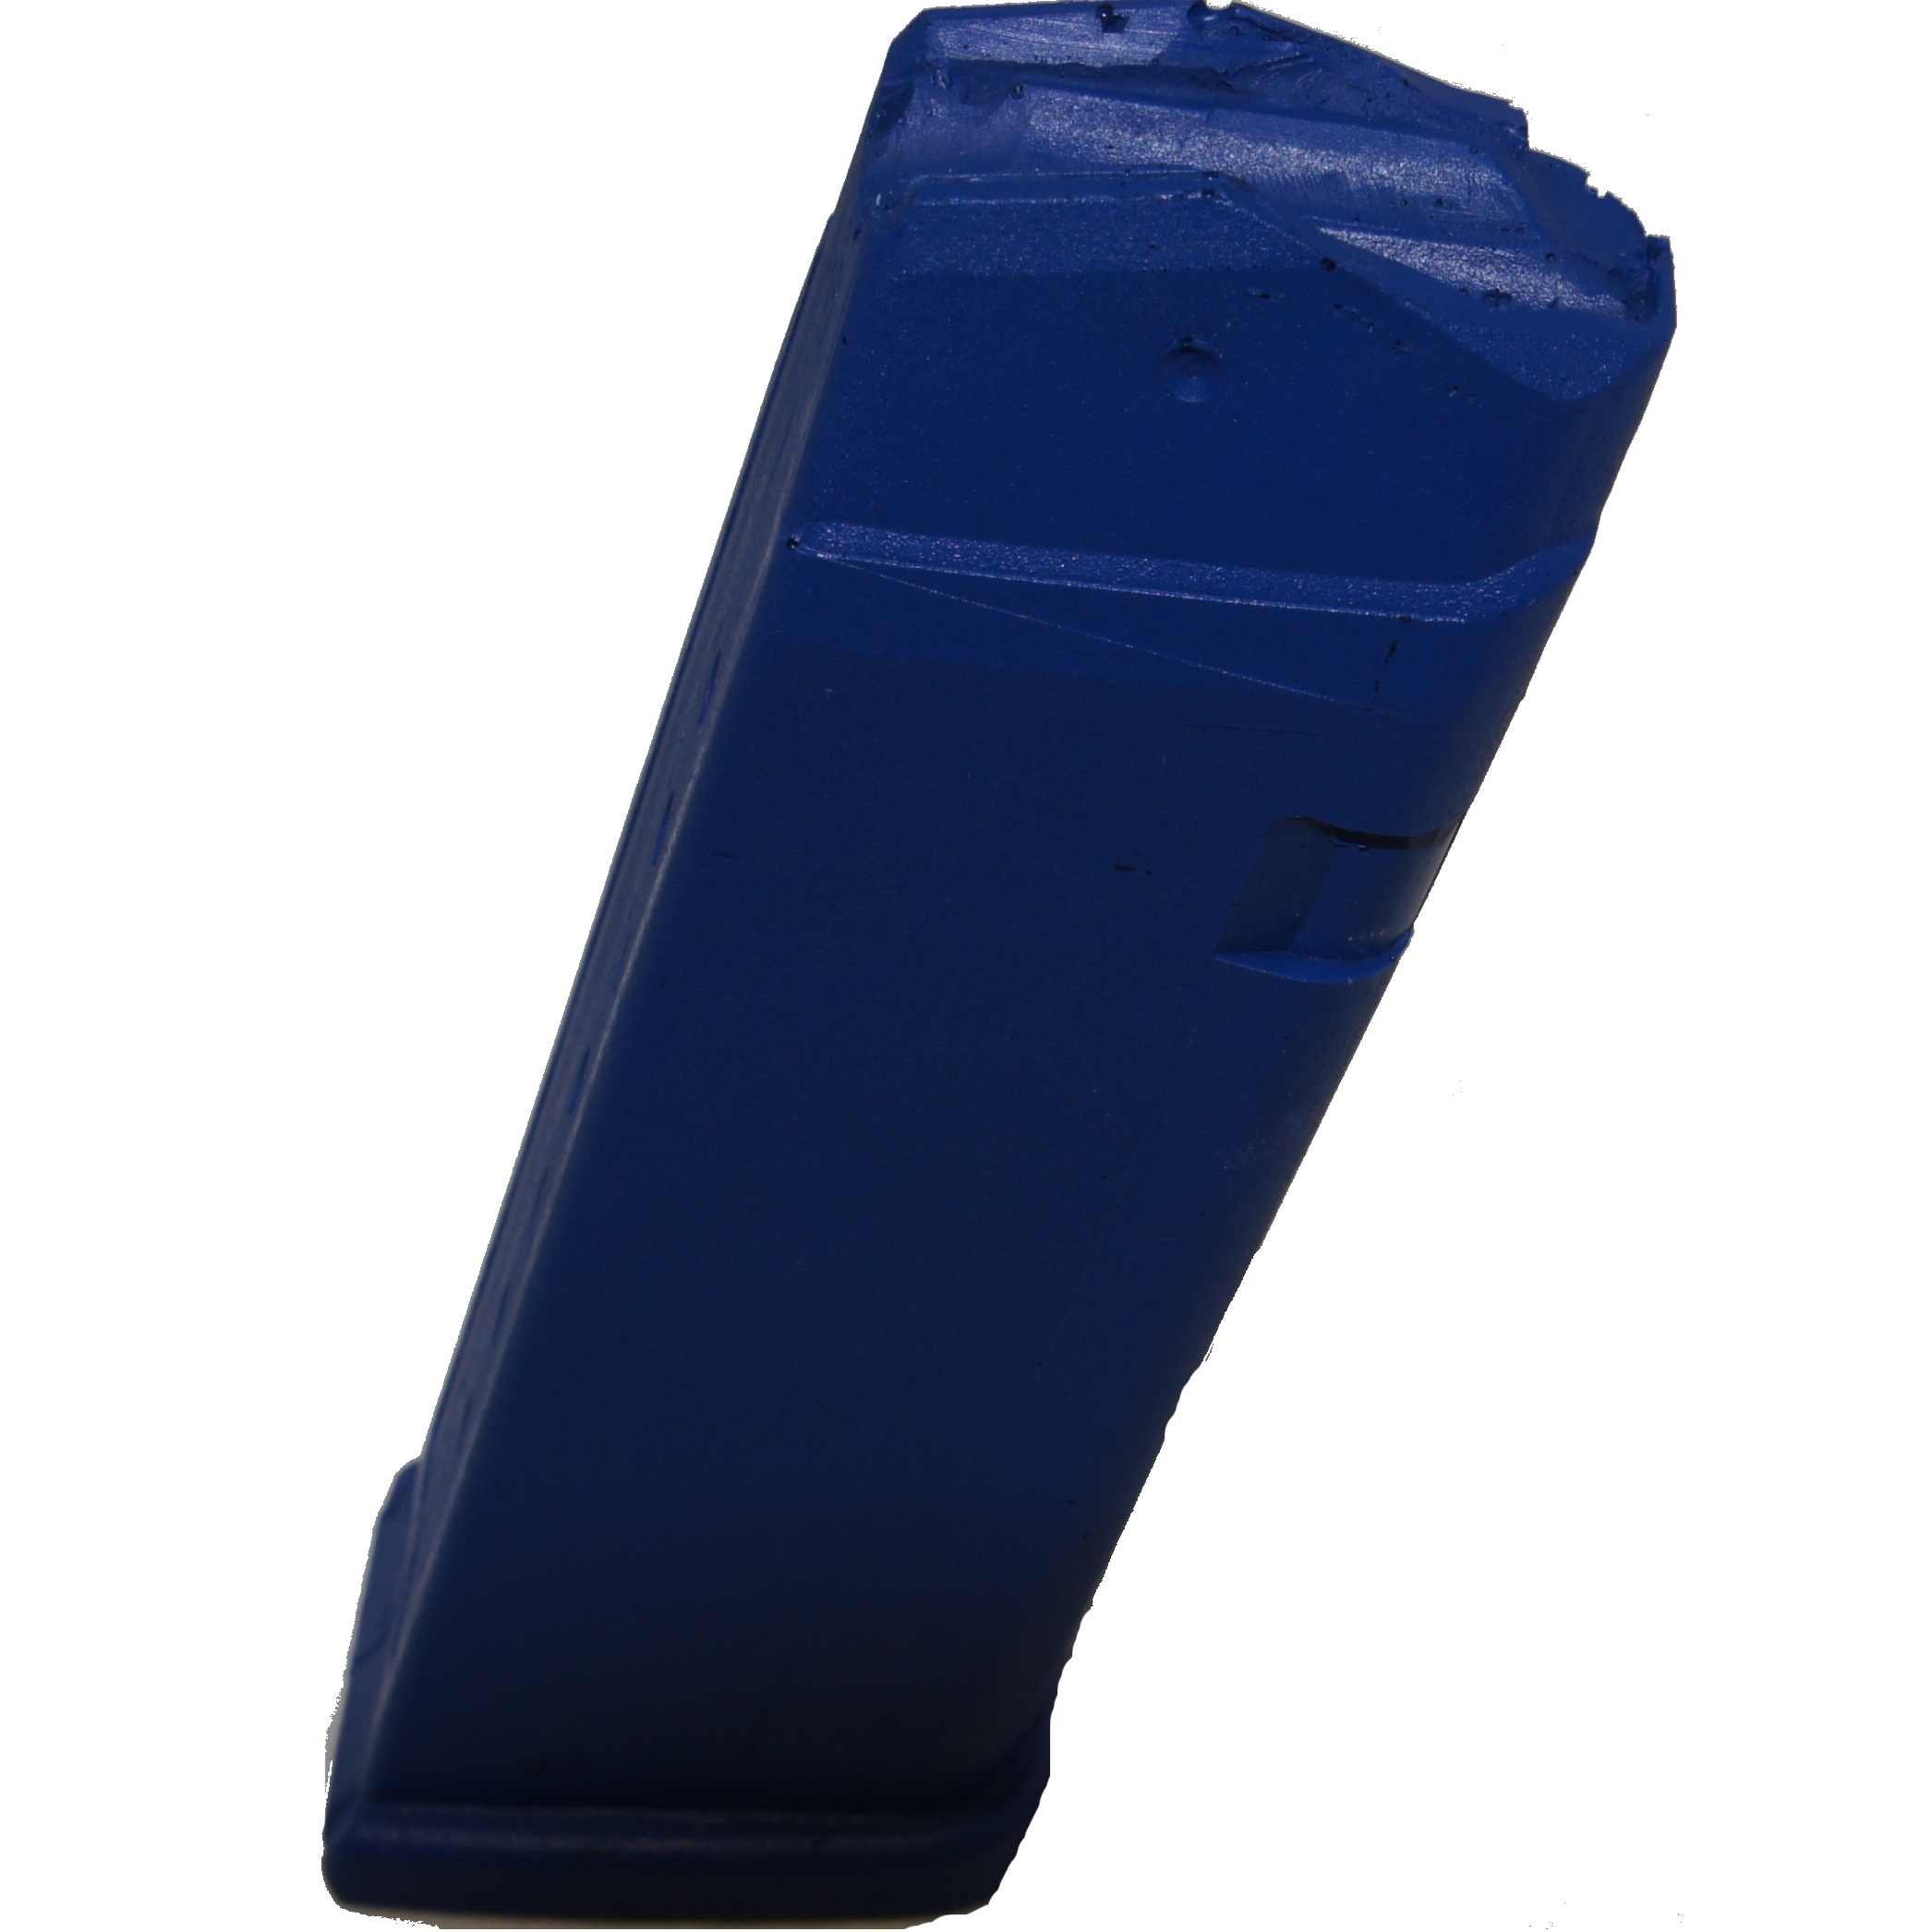 Rings Bluegun Training Gun Magazine Replica Glock - 21 - FSG21M Made In Usa